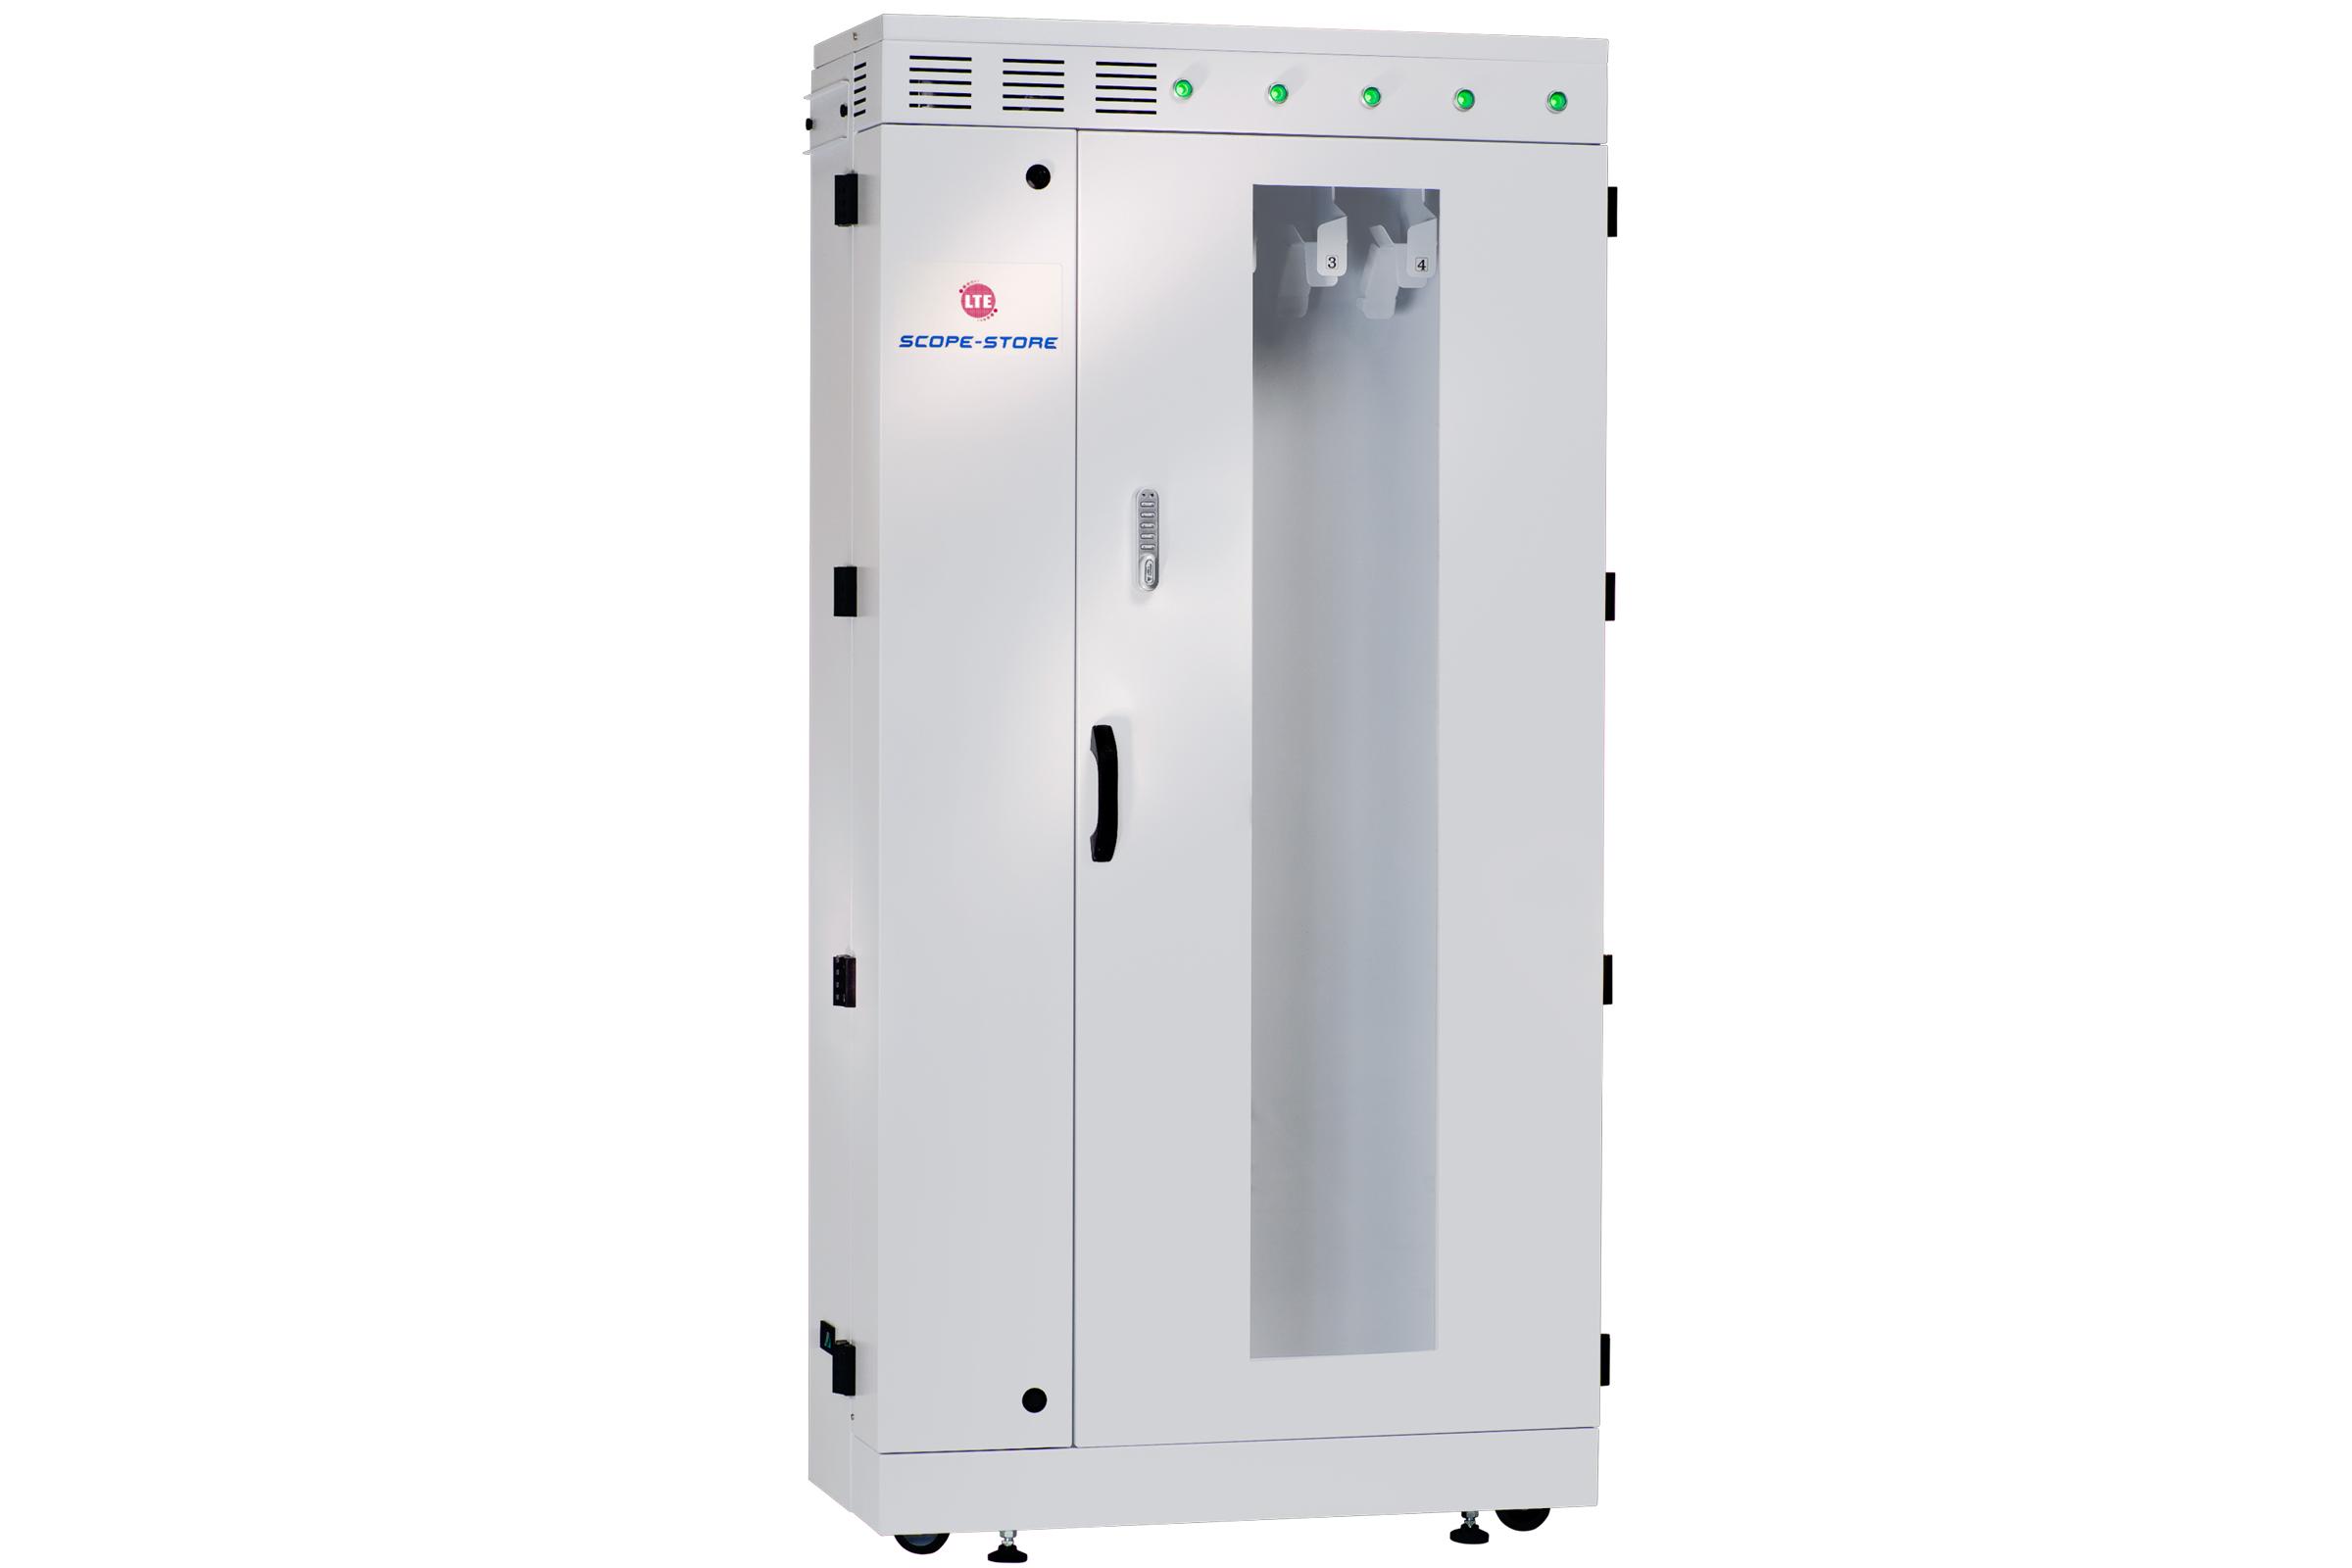 Scope-Store SE Endoscope Storage Cabinets